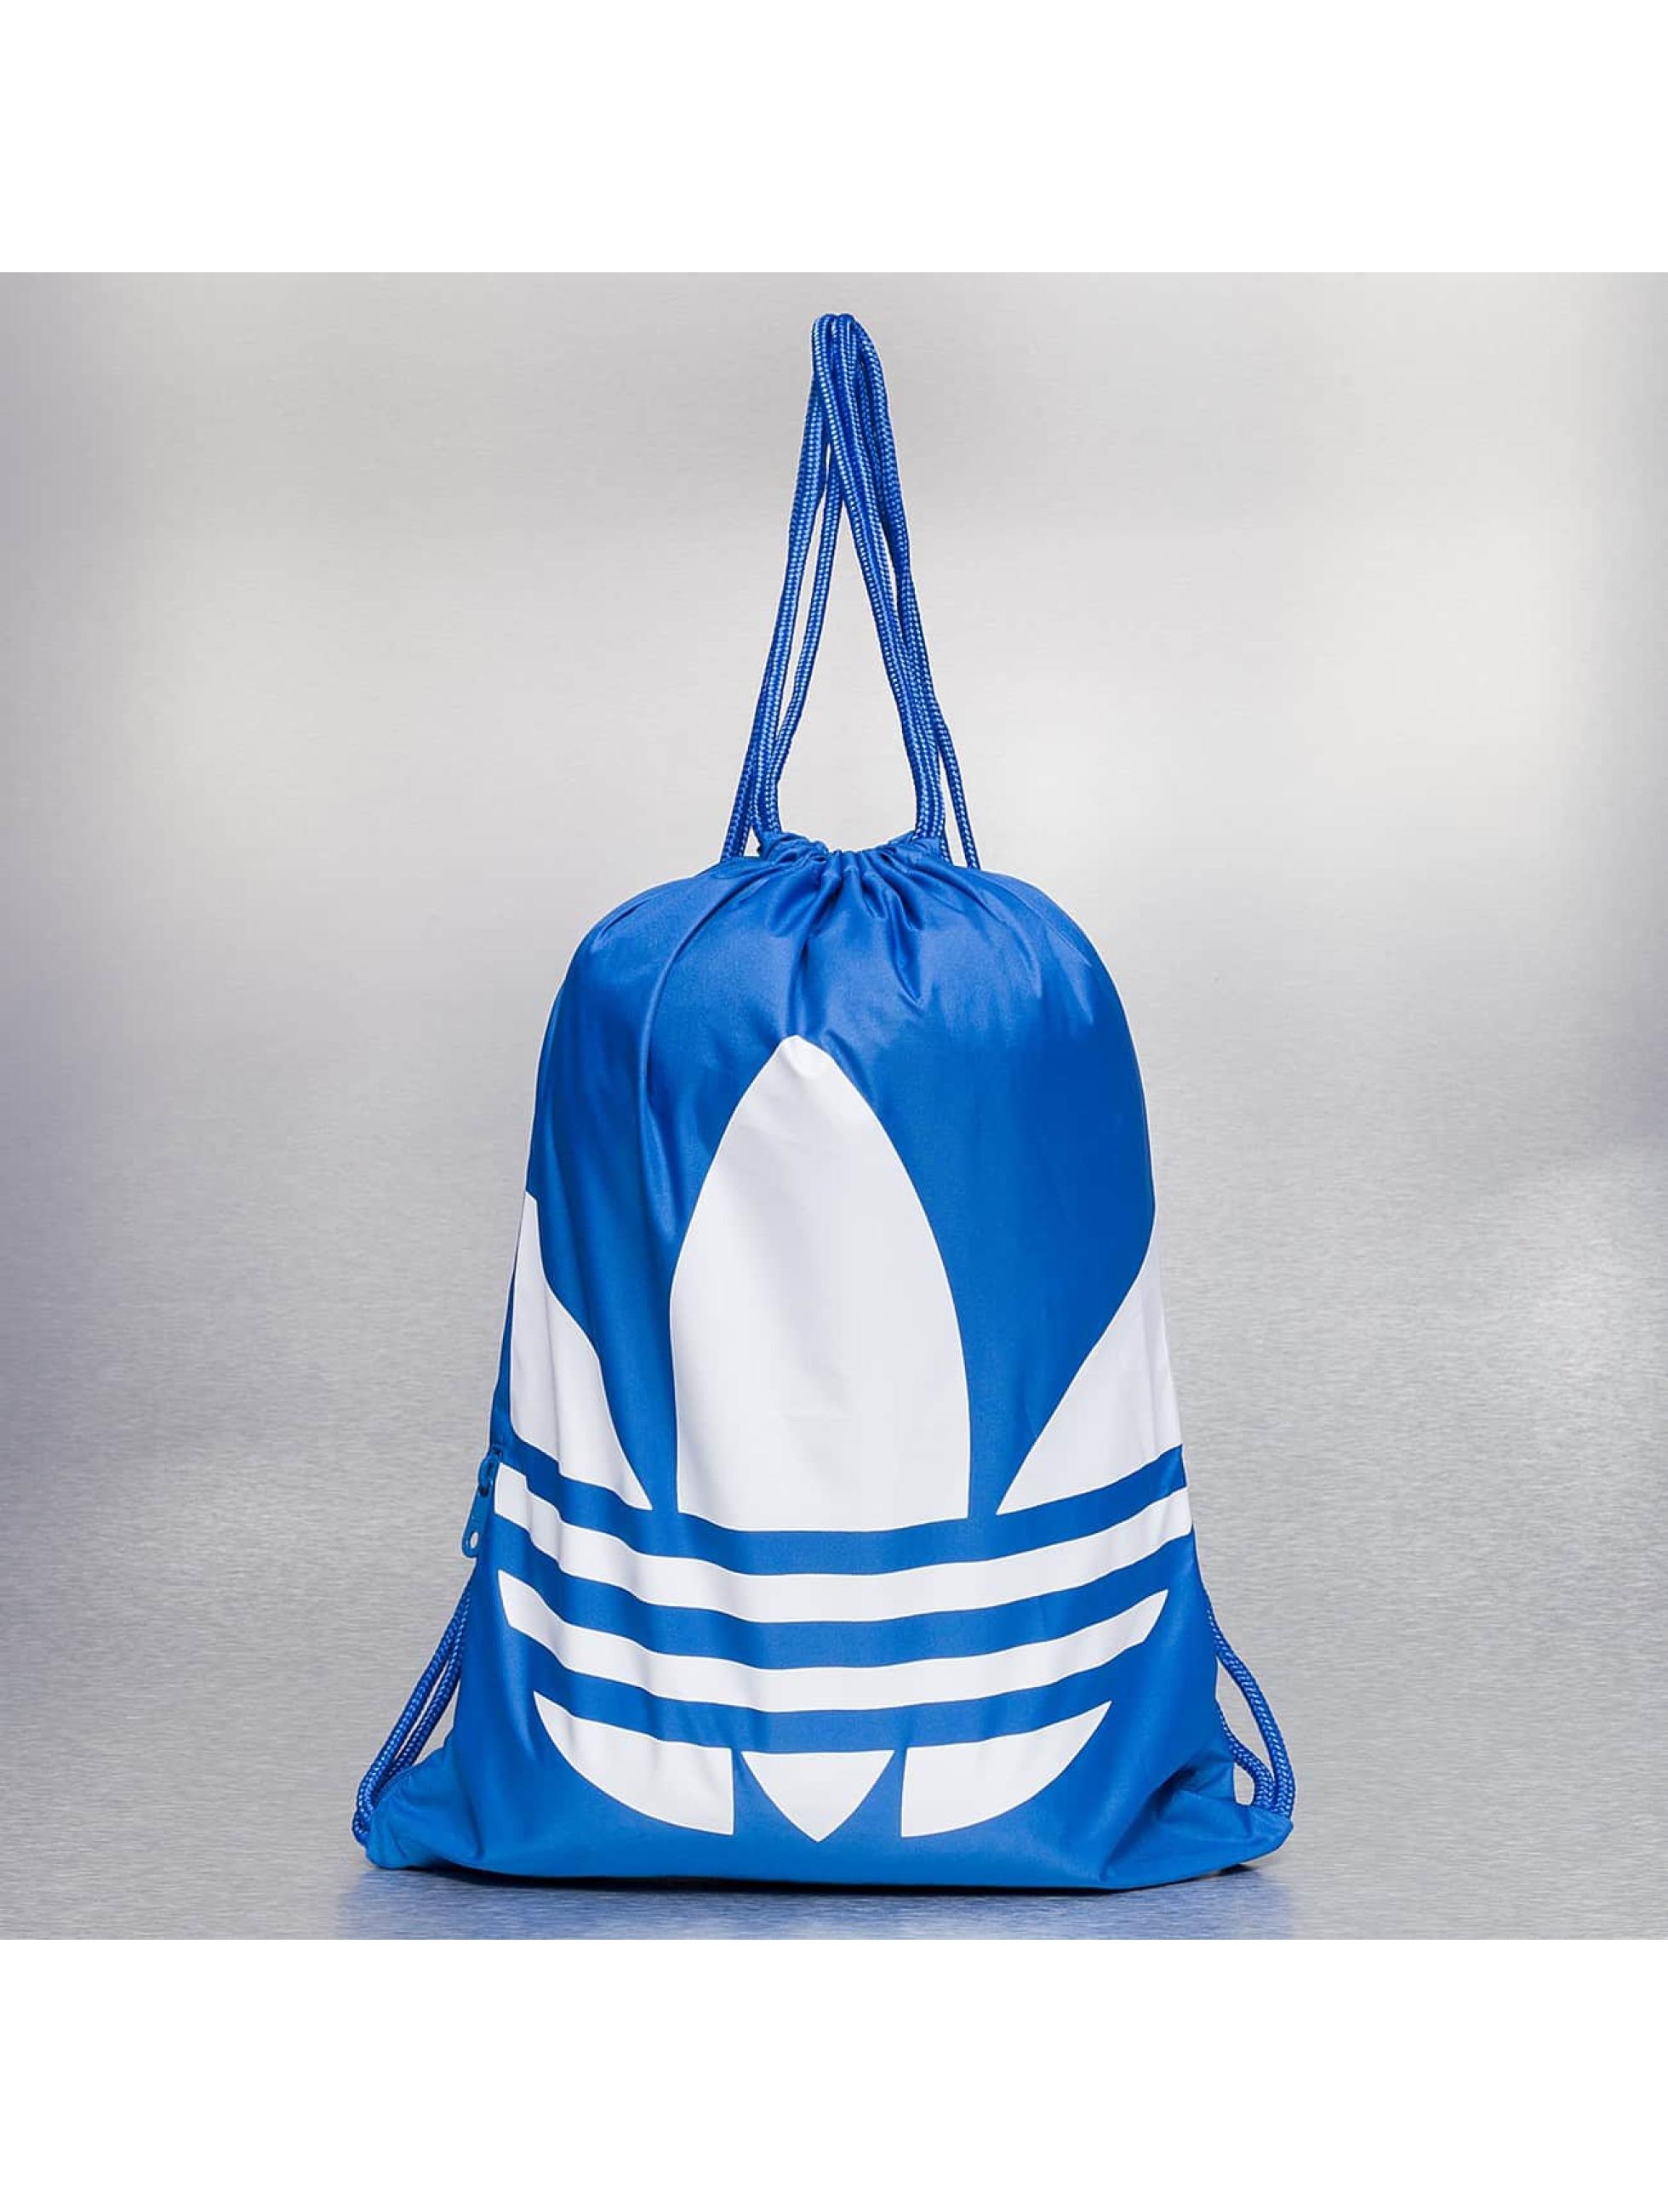 Adidas Originals Shop Frankfurt